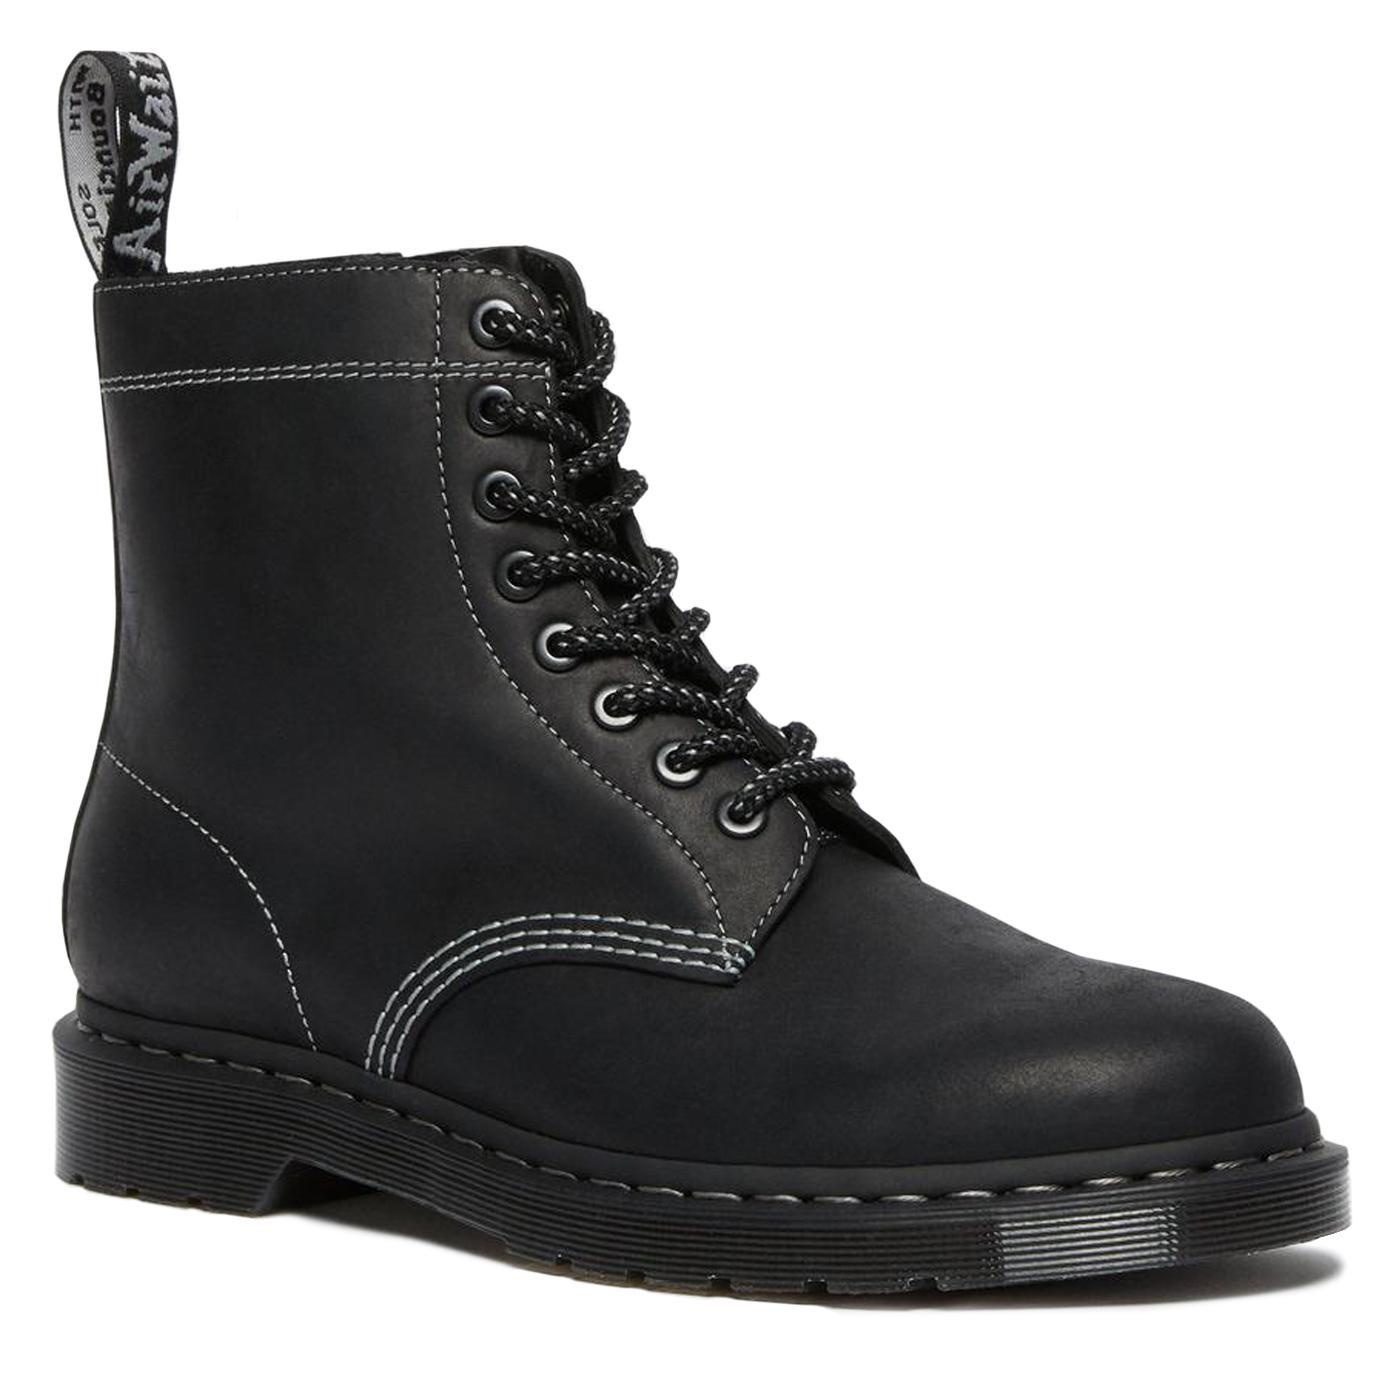 DR MARTENS 1460 Pascal Zipped Boots (Black)